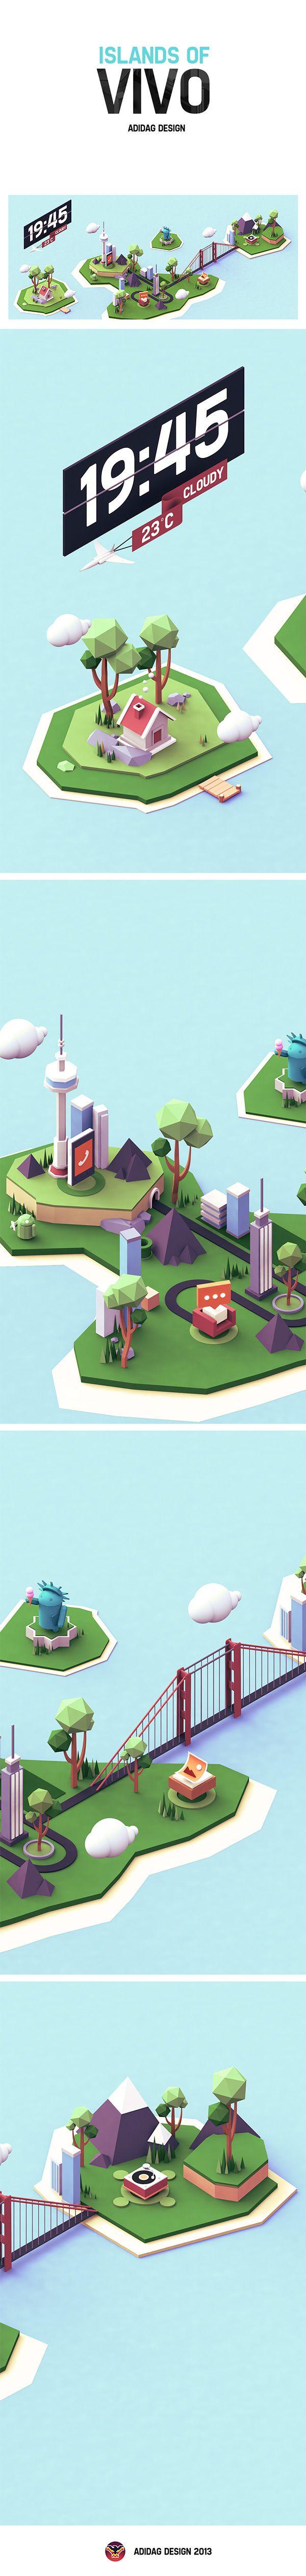 Islands of VIVO on Behance